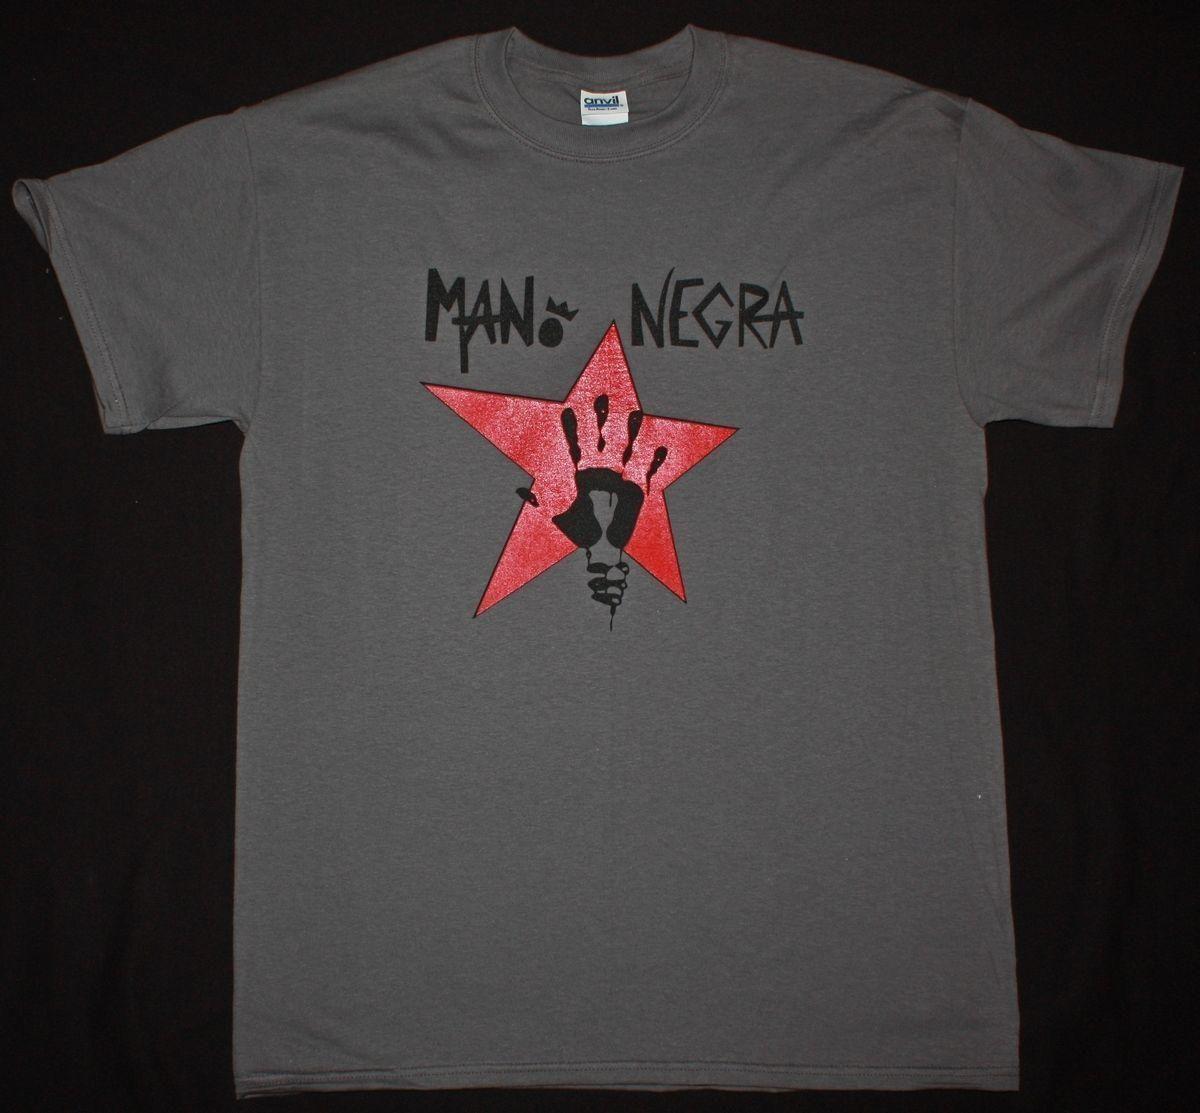 Mens Designer T Shirts Shirt Mano Negra King Of Bongo Manu Chao Mala